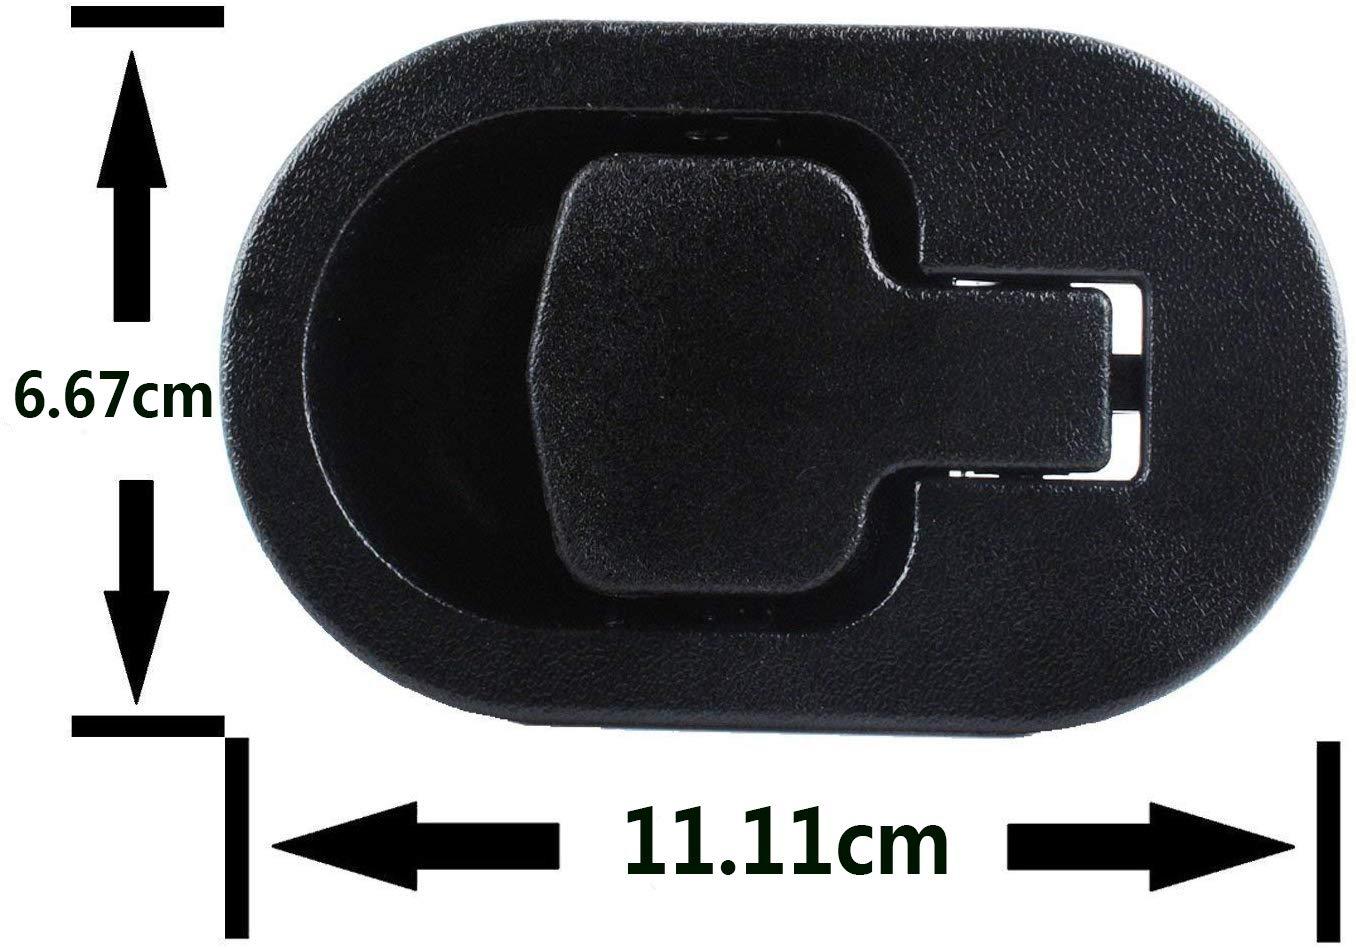 Palanca reclinable y universal de aluminio con tirador de metal para sill/ón de VORCOOL mango con cable de 96 cm